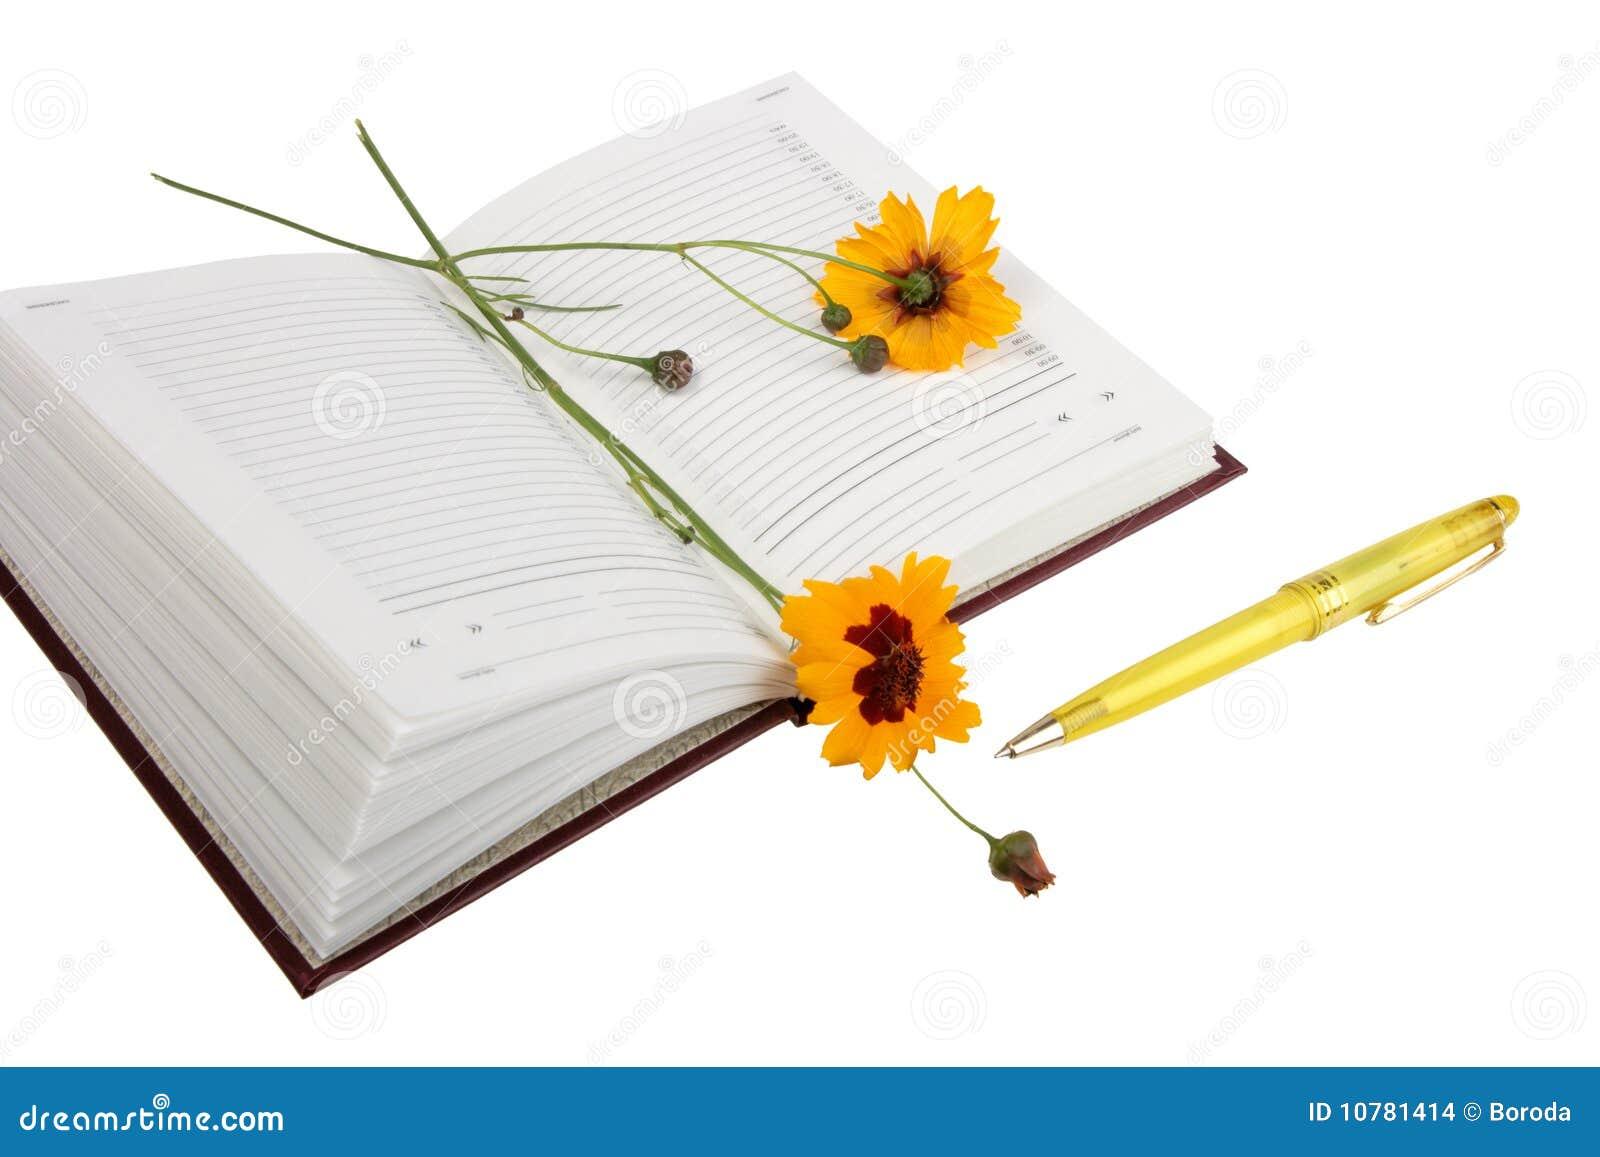 Lege open agenda, gele bloemen en gele bal p